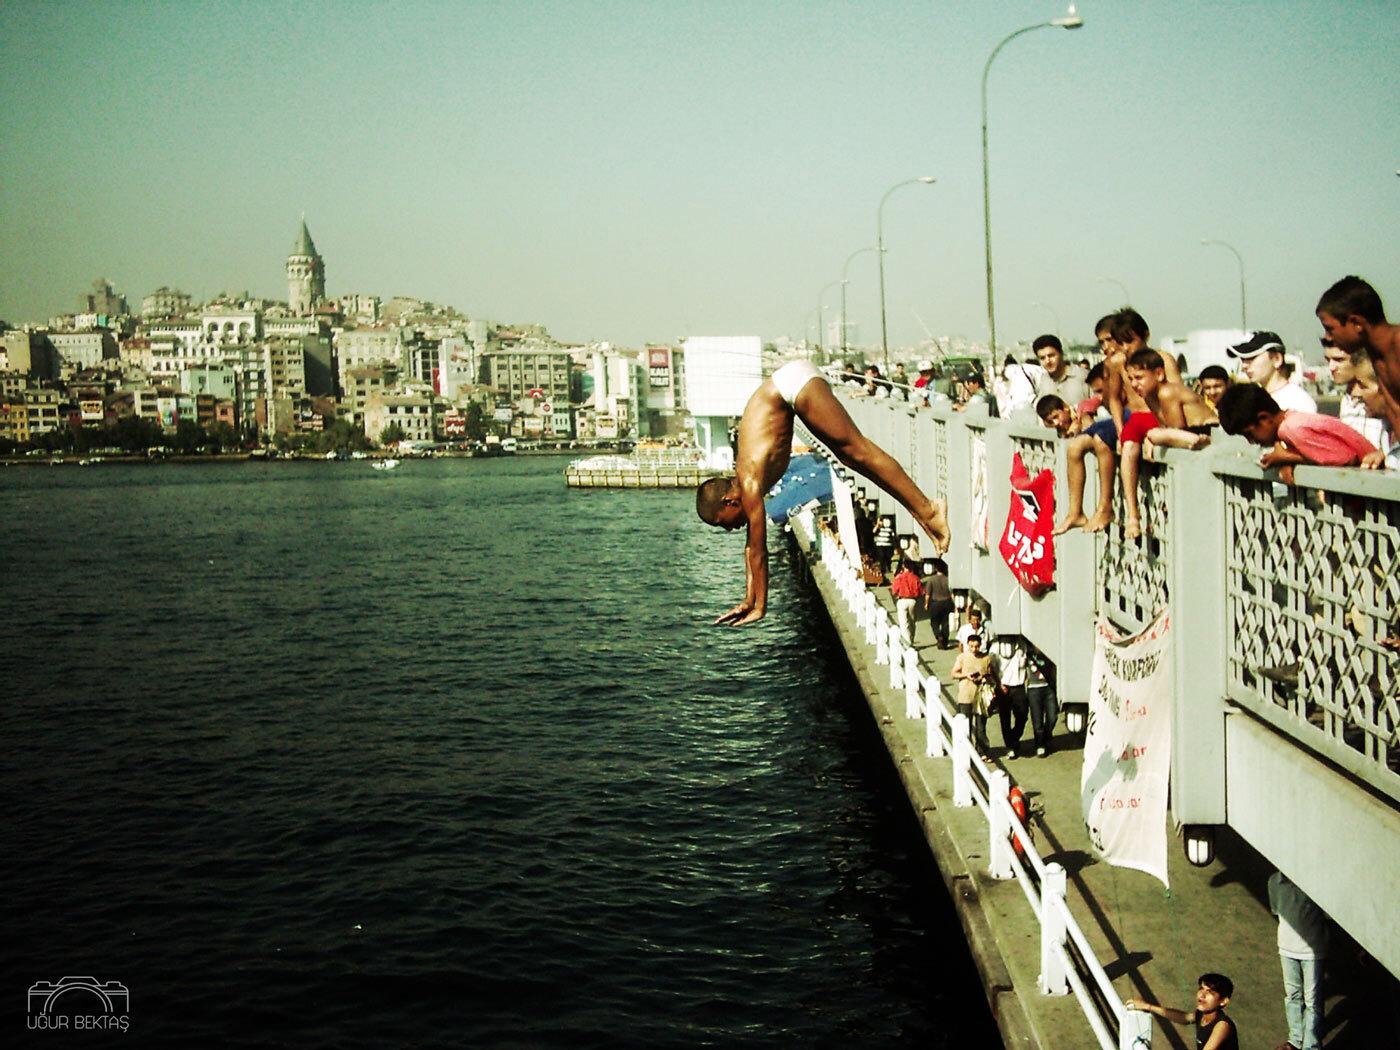 istanbul_galata_koprusu_manzara_cocuklar_jpg.jpg